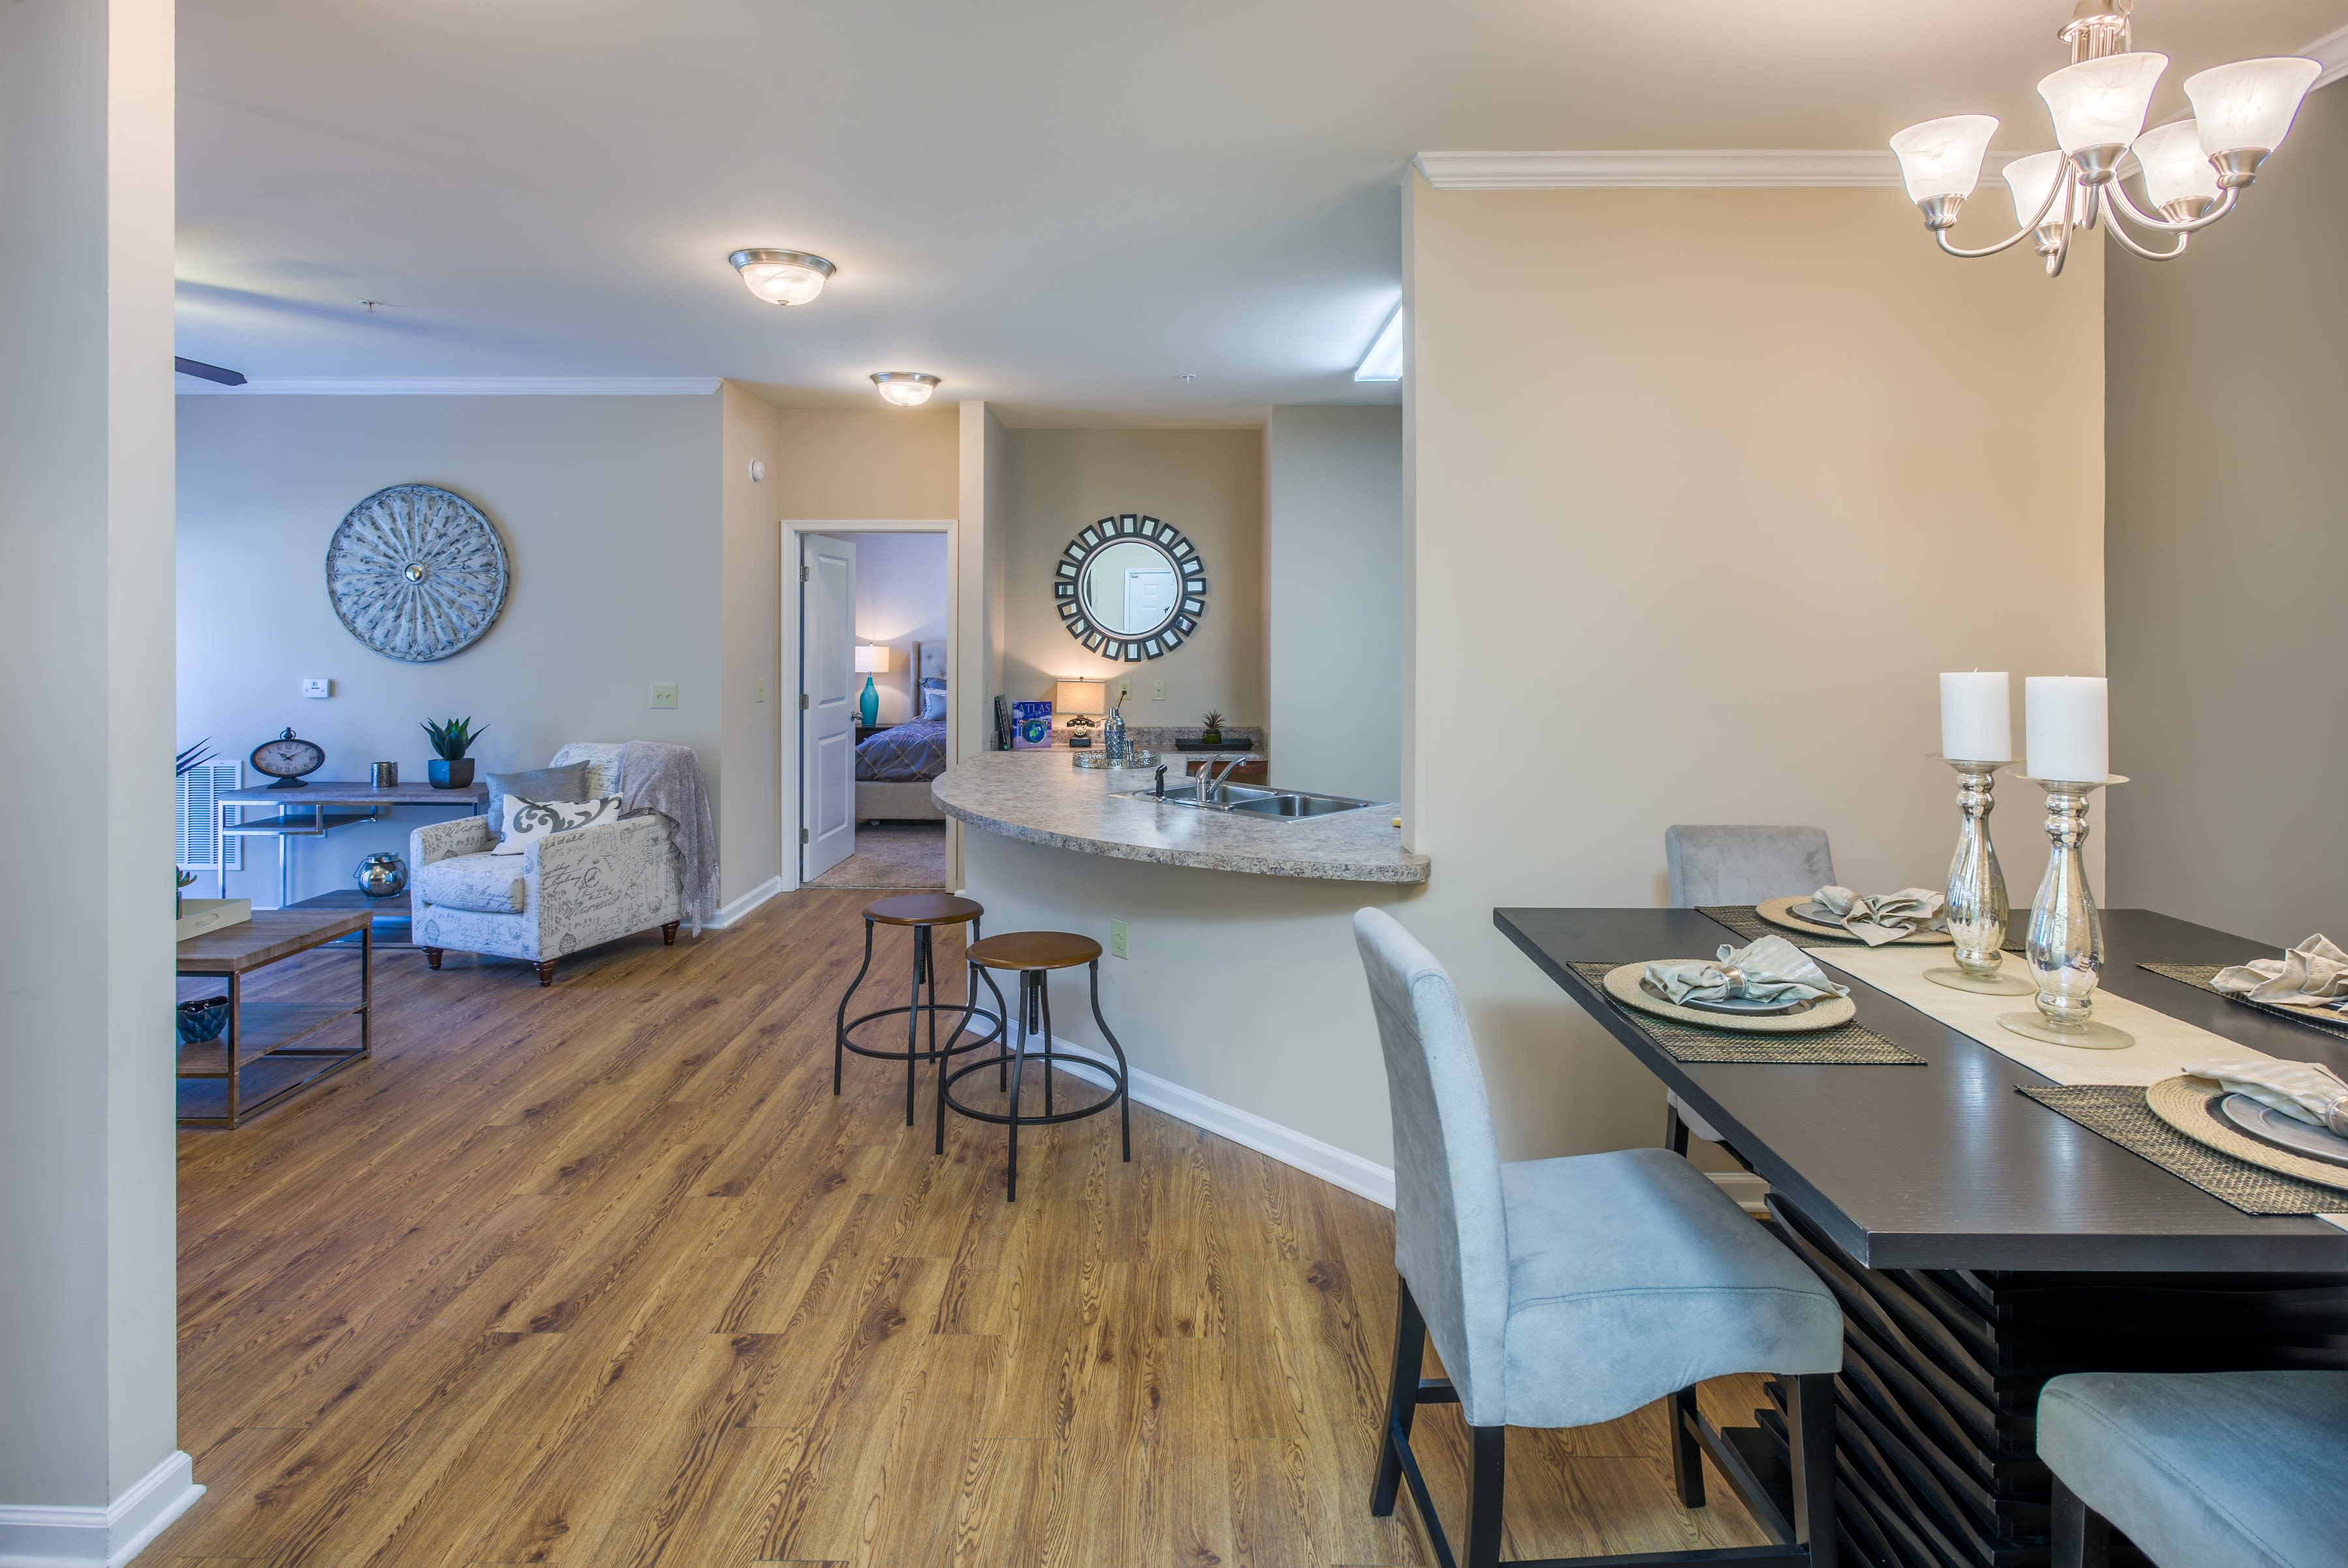 Apartment interior with hardwood flooring at Arbor Village in Summerville, South Carolina